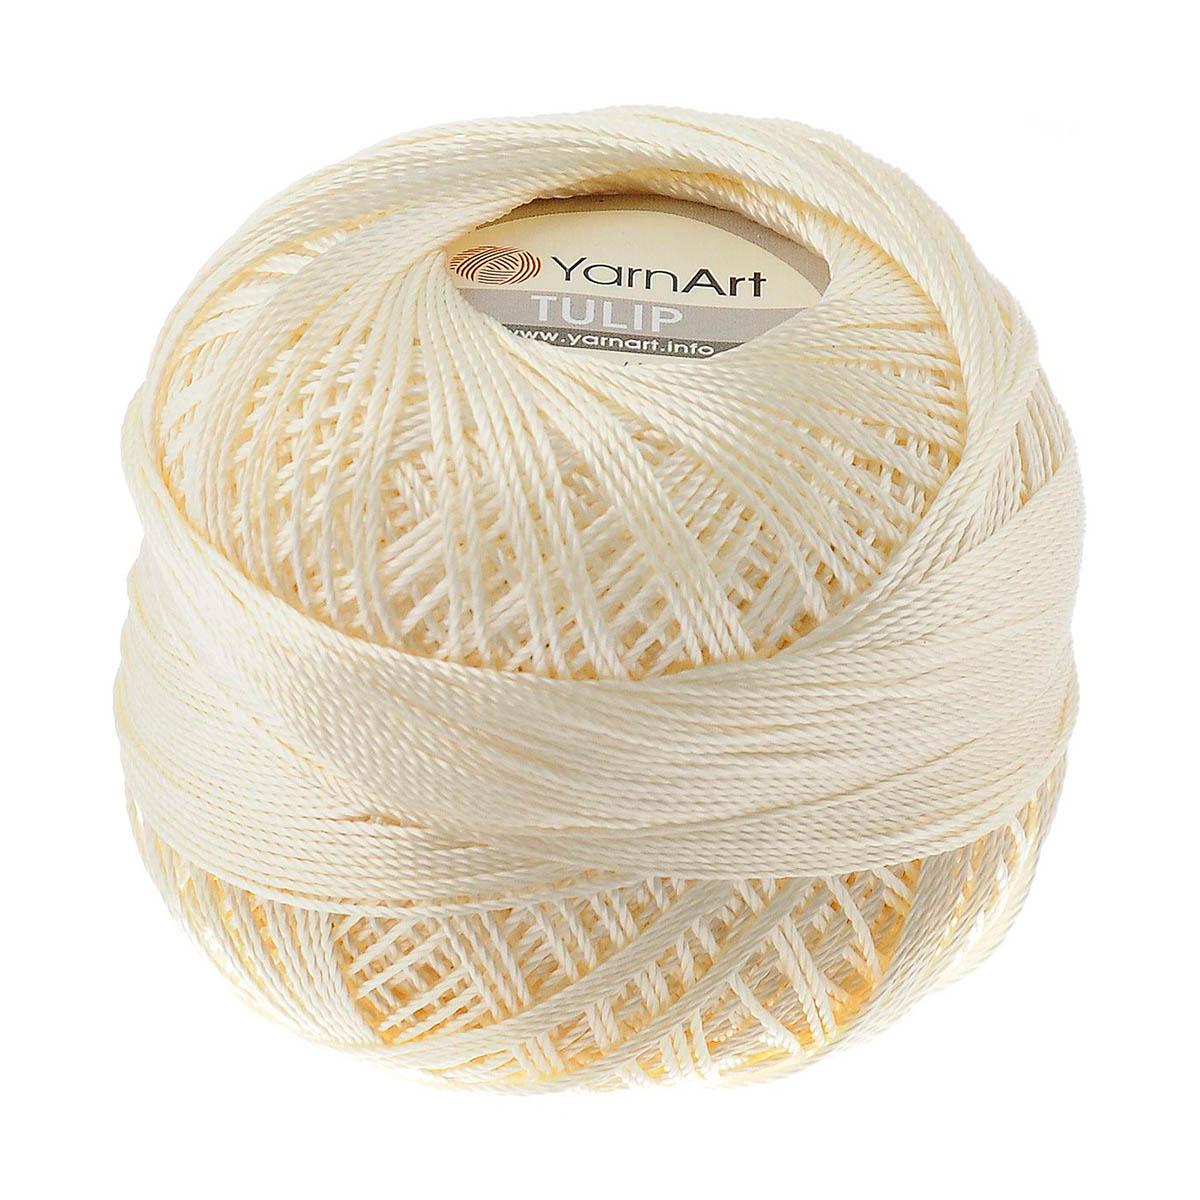 Пряжа YarnArt 'TULIP (Ирис)' 50г 250м 100% м/ф (437 светло-желтый) фото